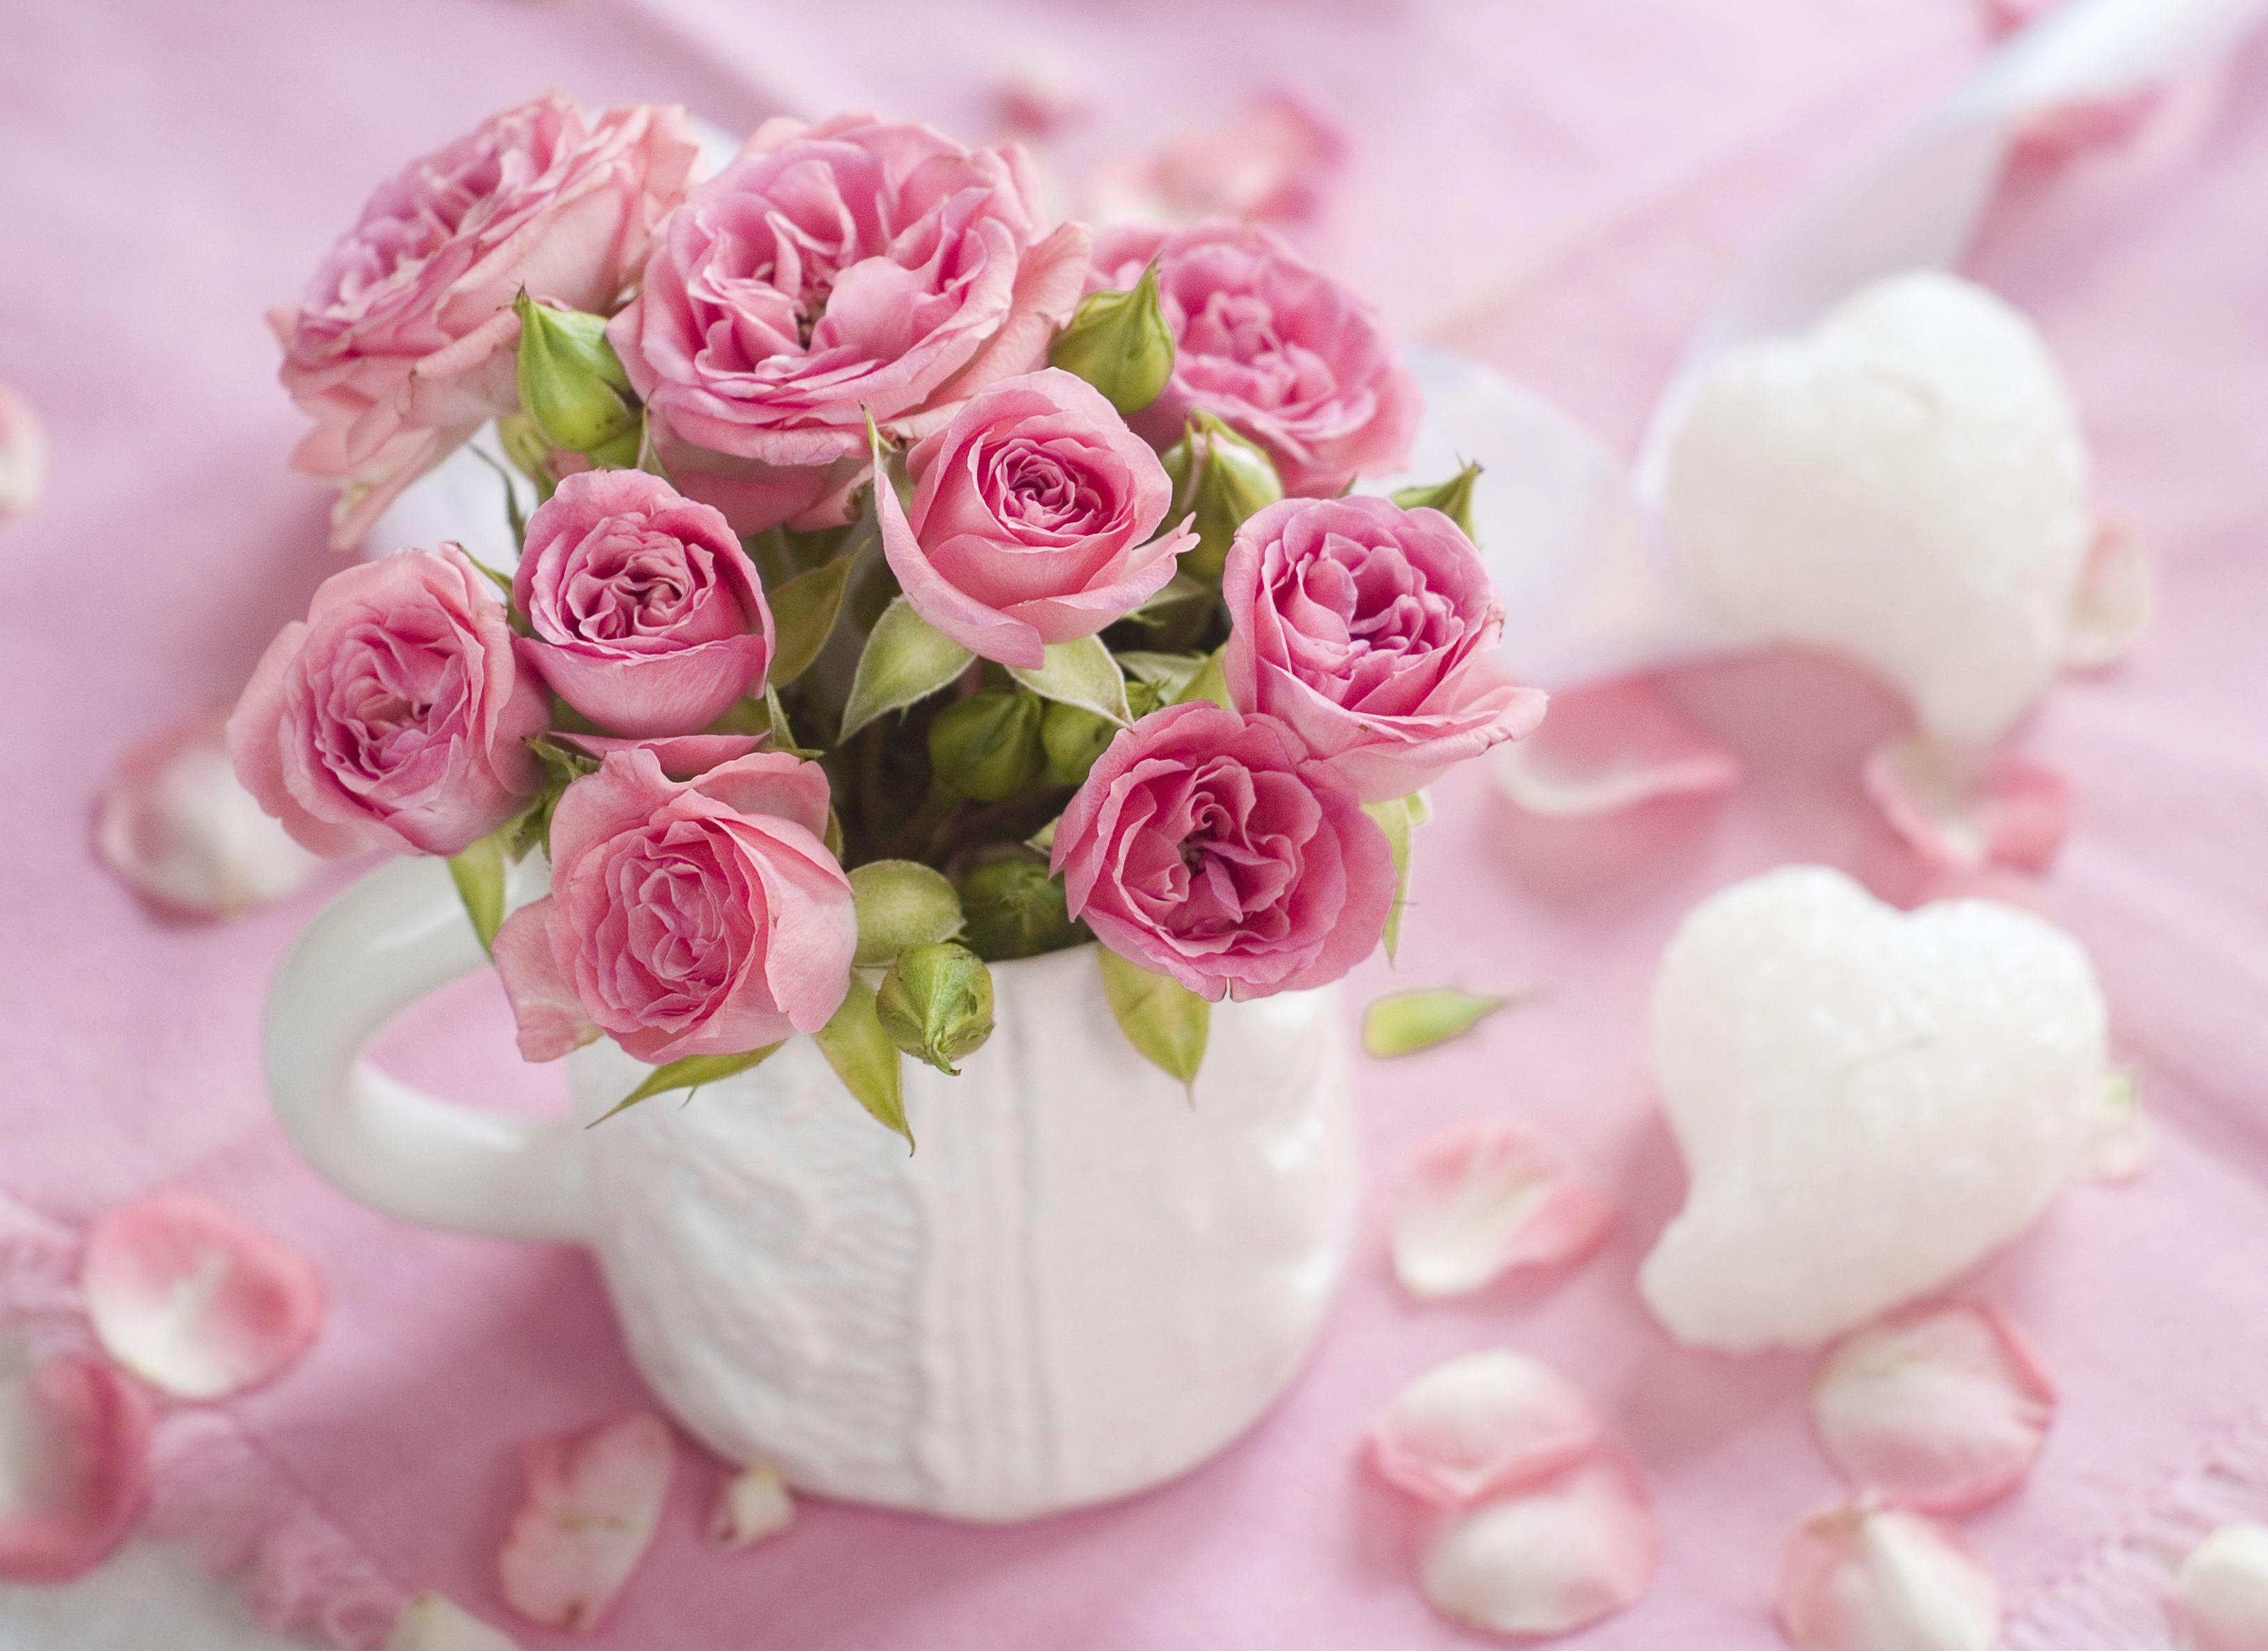 A Romantic Valentine's Day  in the Czech Republic